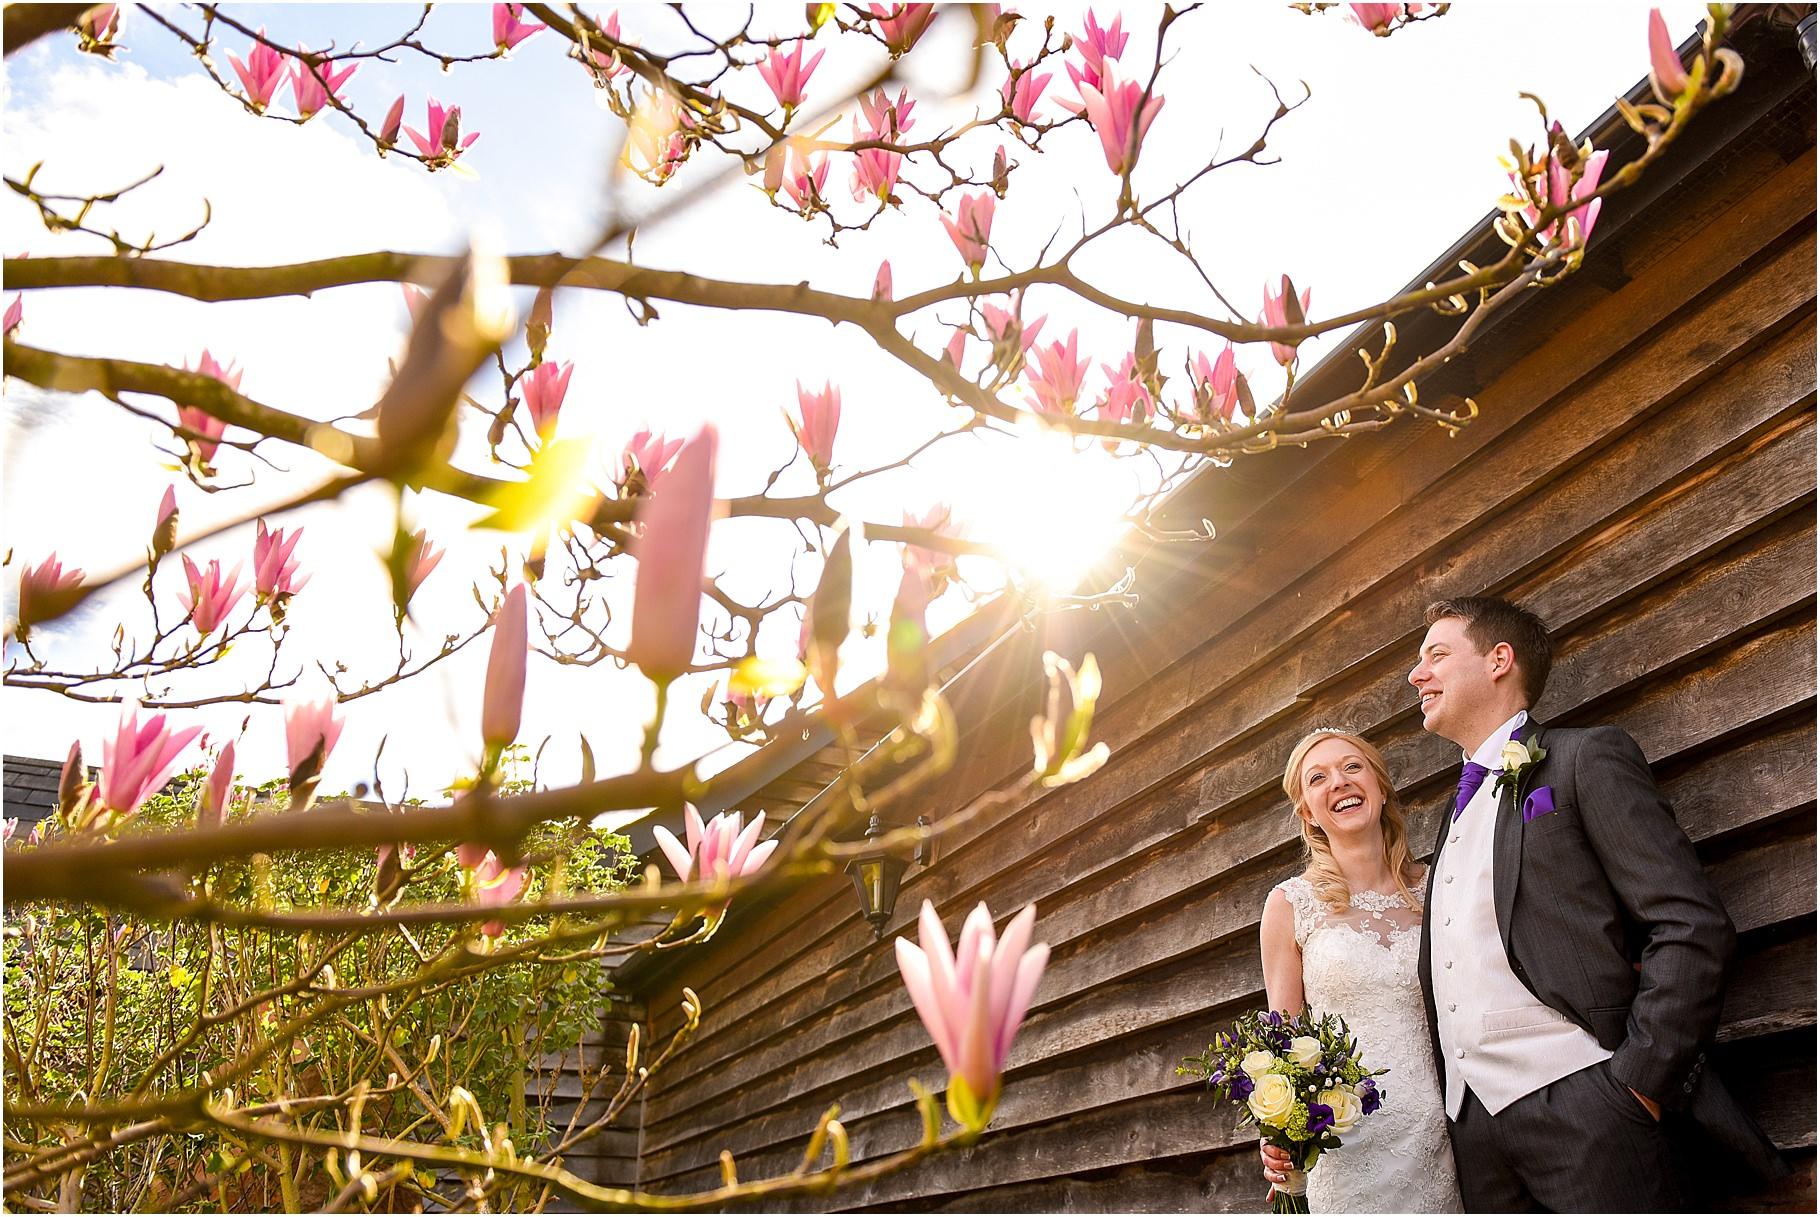 dan-wootton-photography-2017-weddings-126.jpg